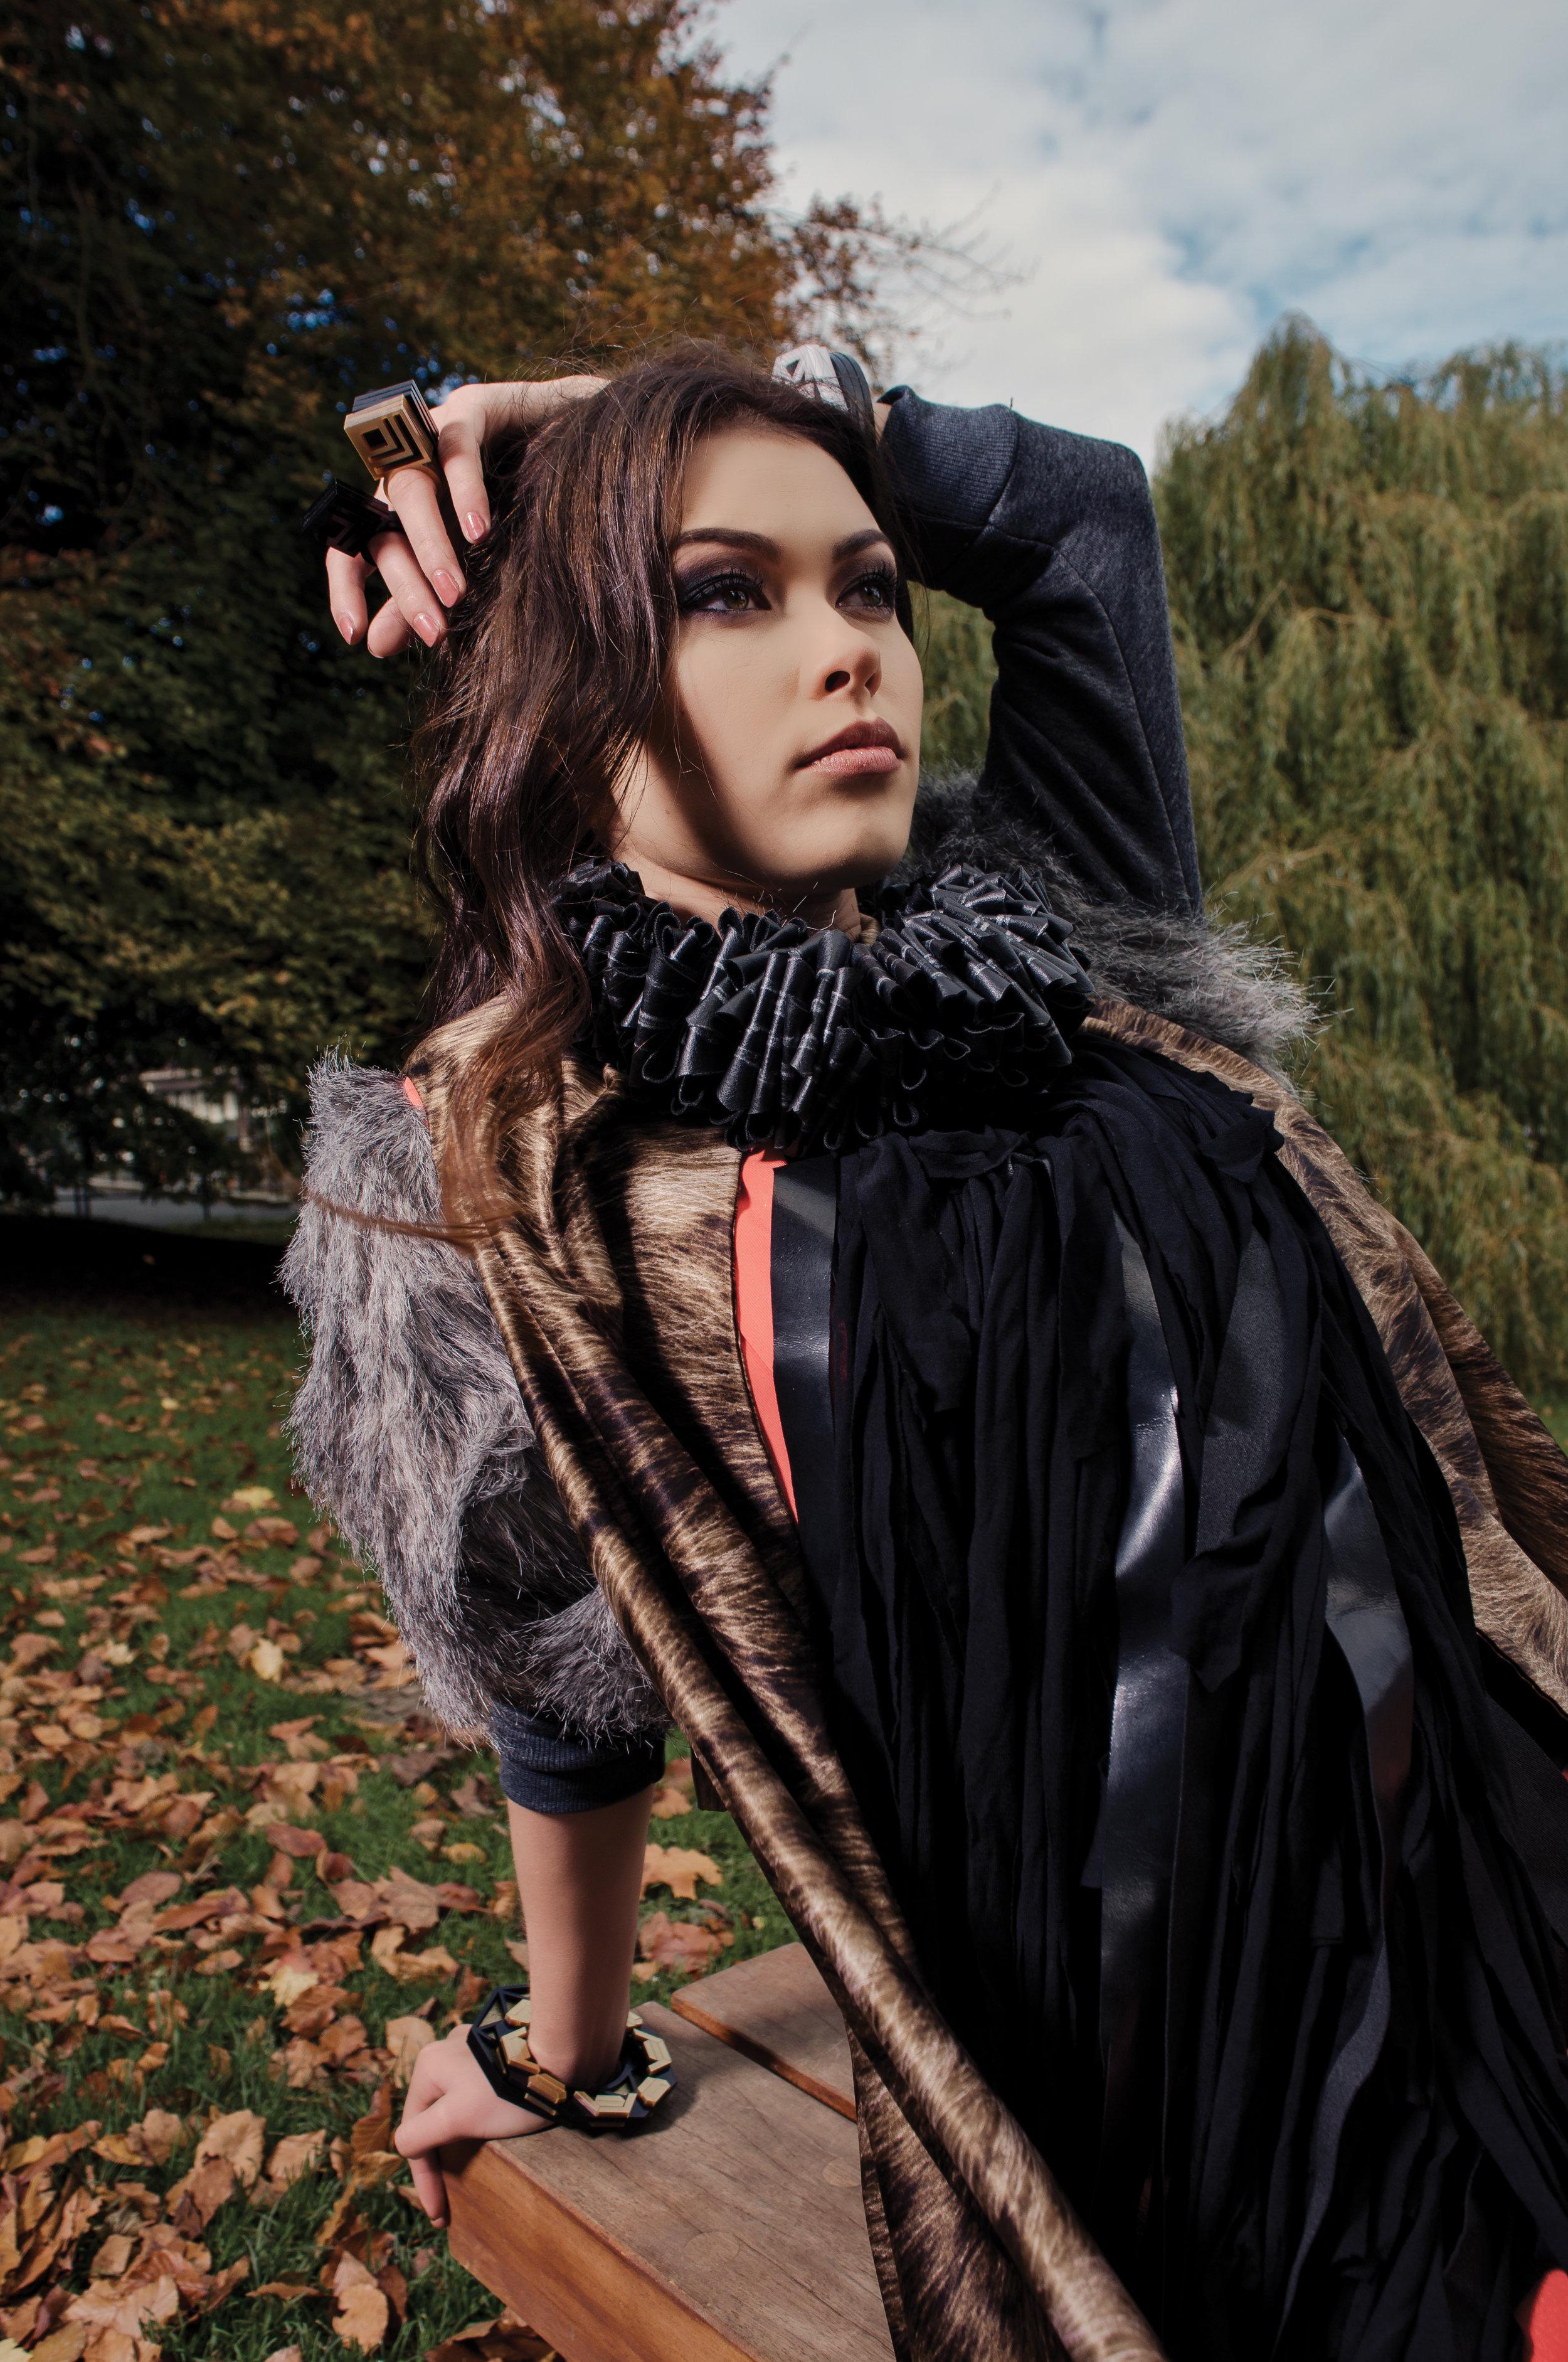 zaramia-ava-zaramiaava-leeds-fashion-designer-ethical-sustainable-tailored-minimalist-jacket-accent-coat-jacket-print-shirt-top-versatile-drape-cowl-styling-shop-womenswear-models-photoshoot-colour-10